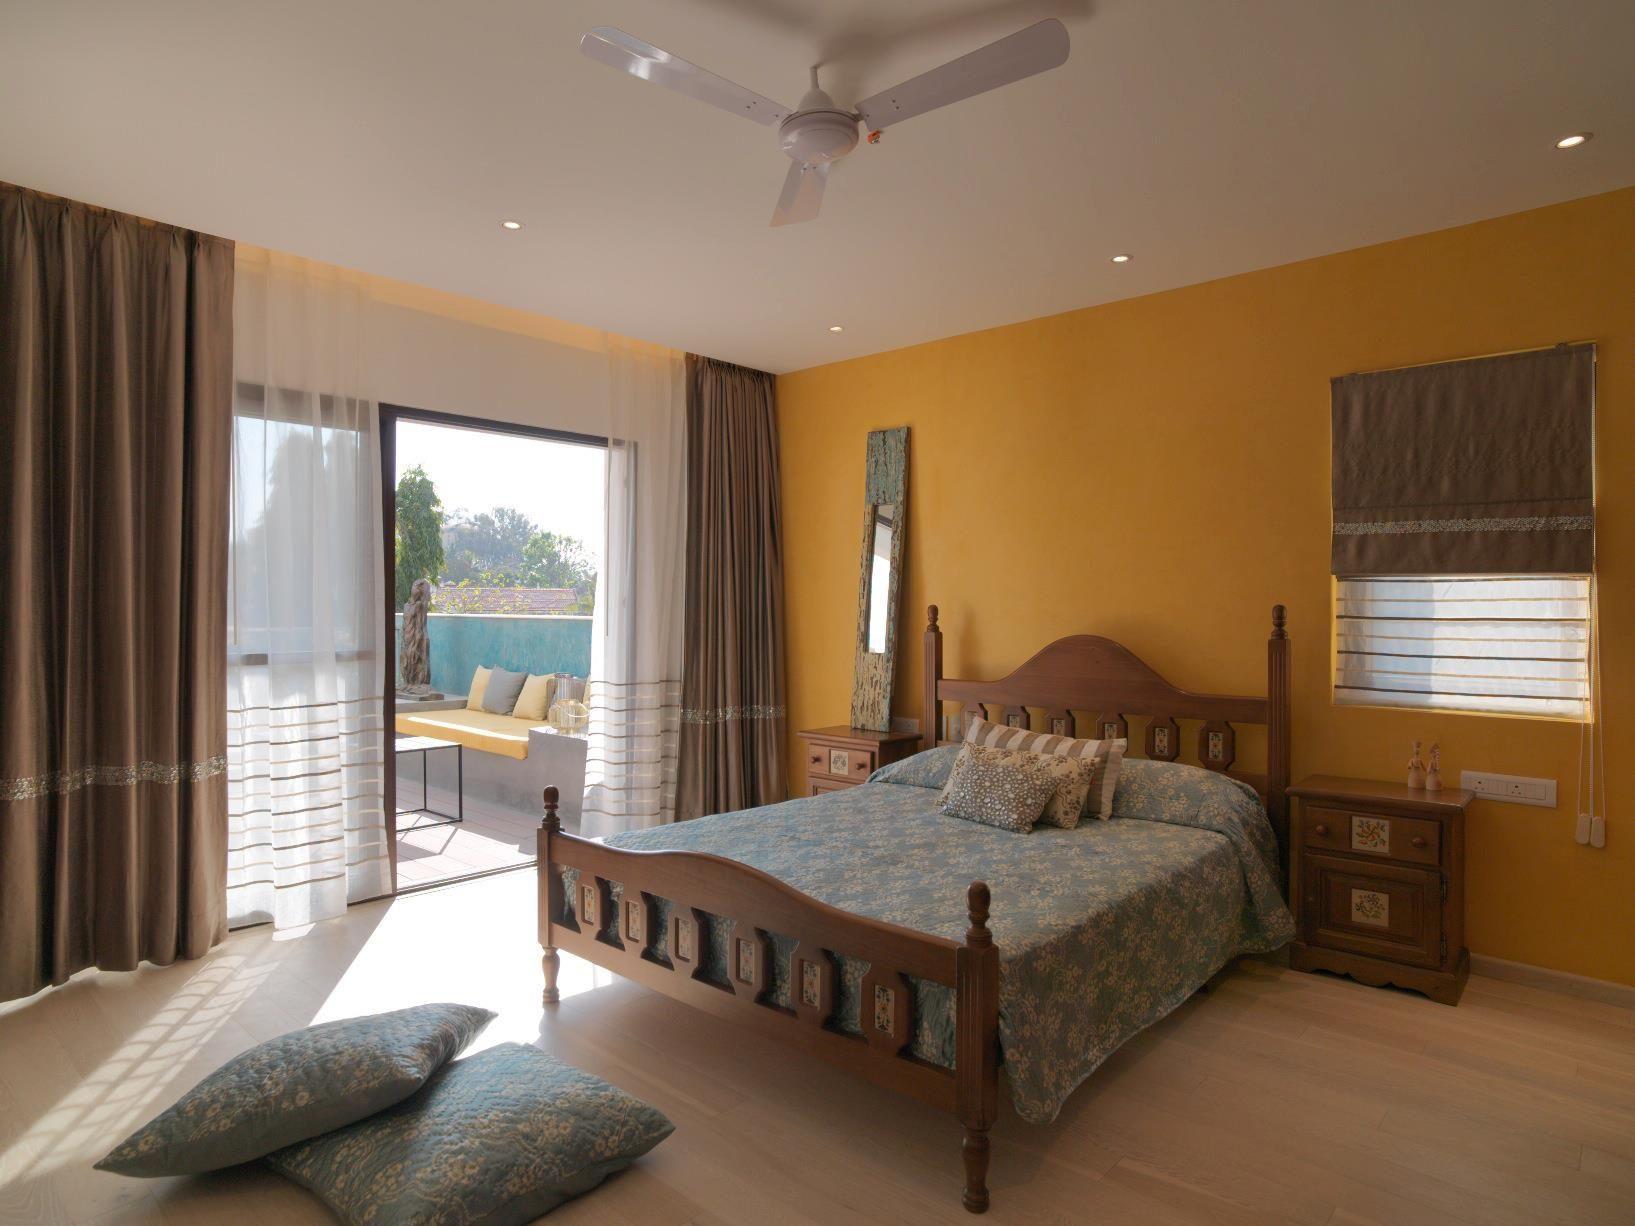 Interior Design For Bedroom In India 200 Bedroom Designs  Bedroom Modern Master Bedroom Design And